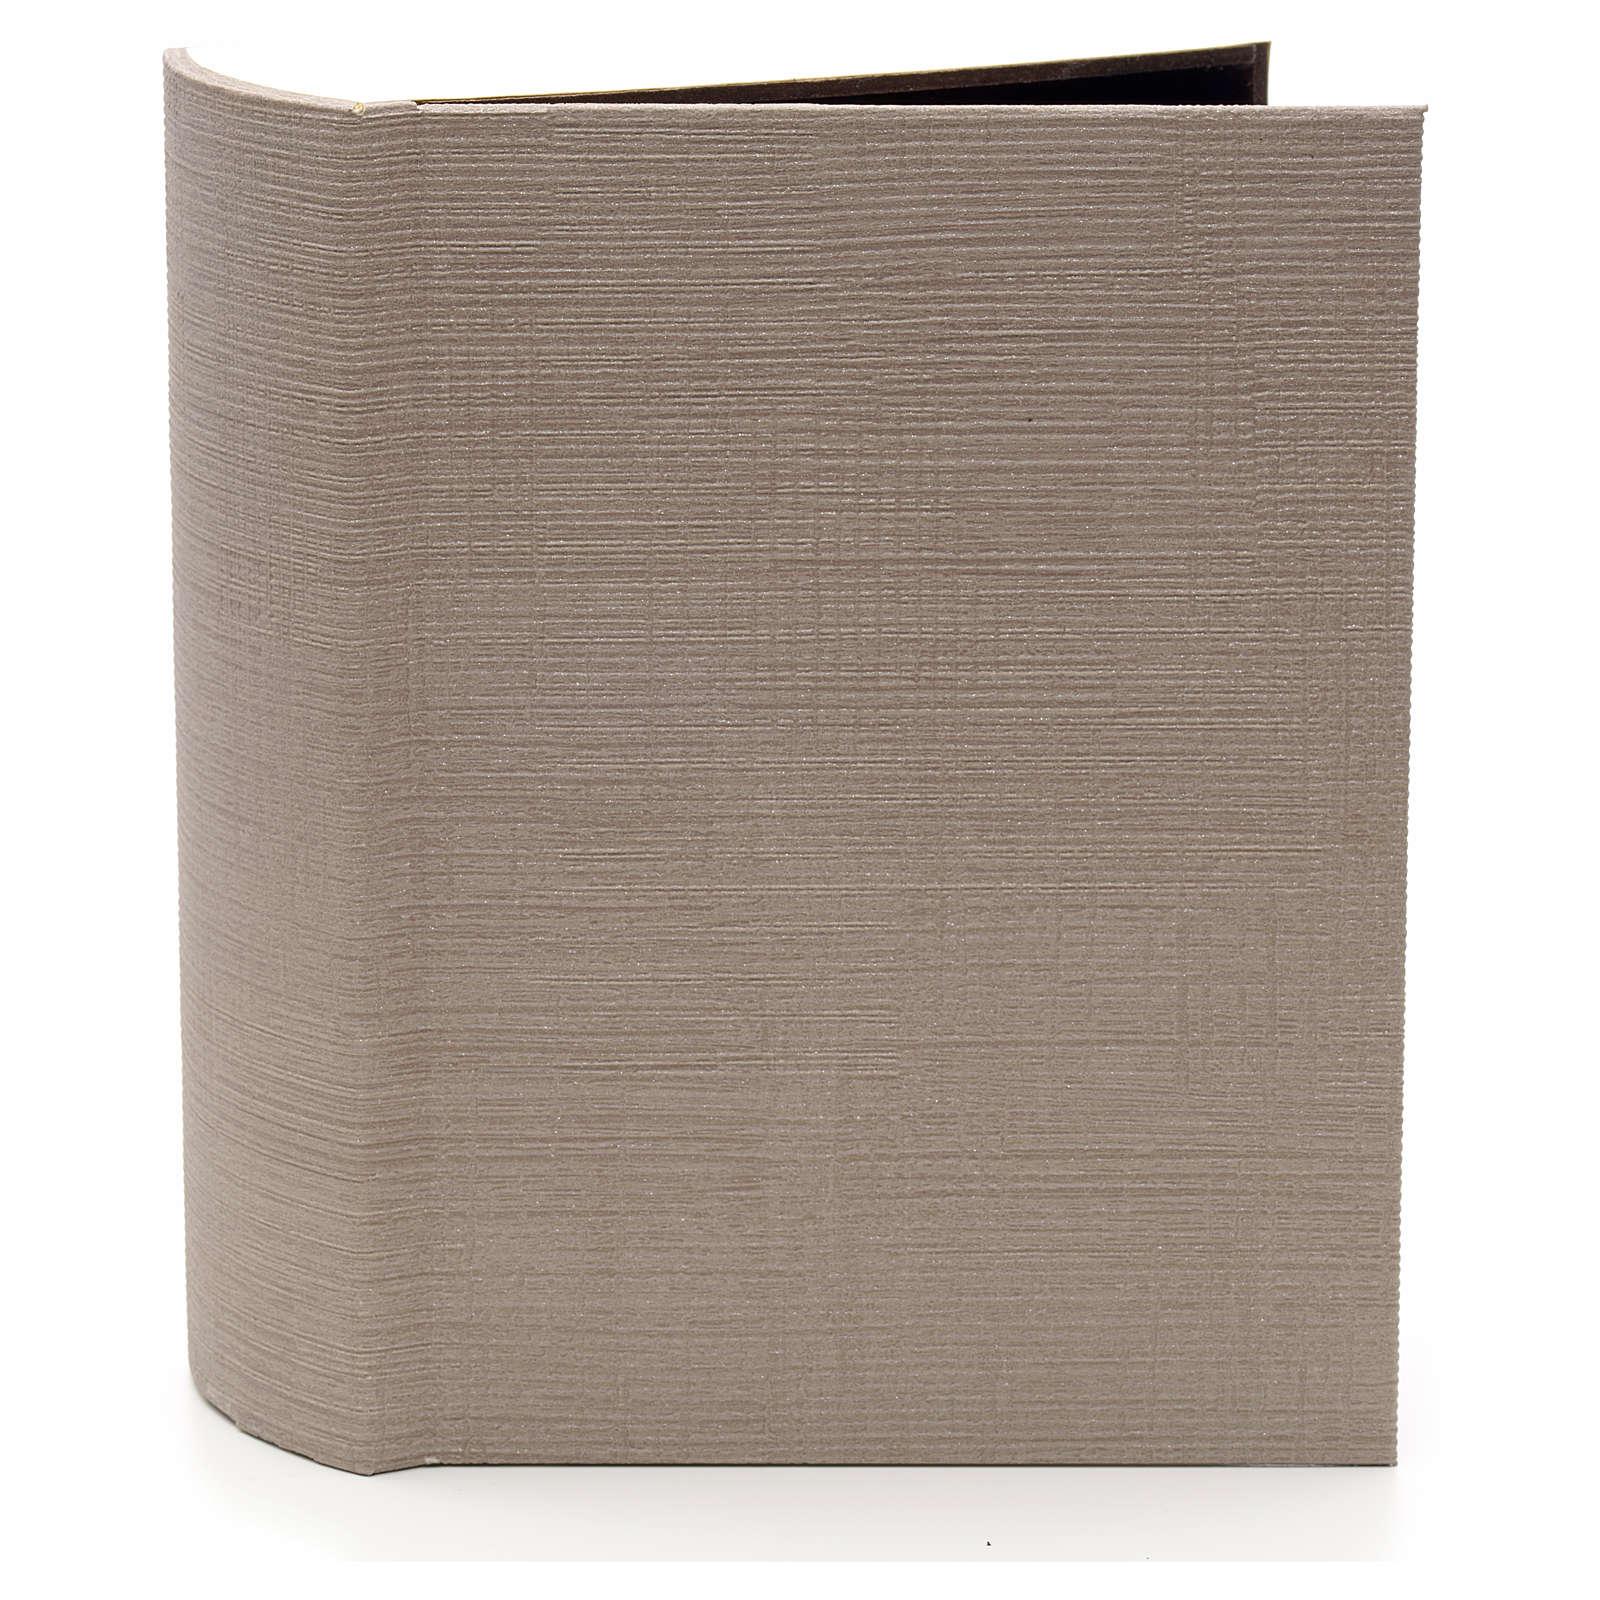 Grotta illuminata per presepe in libro dim. 24x19x8 cm 4